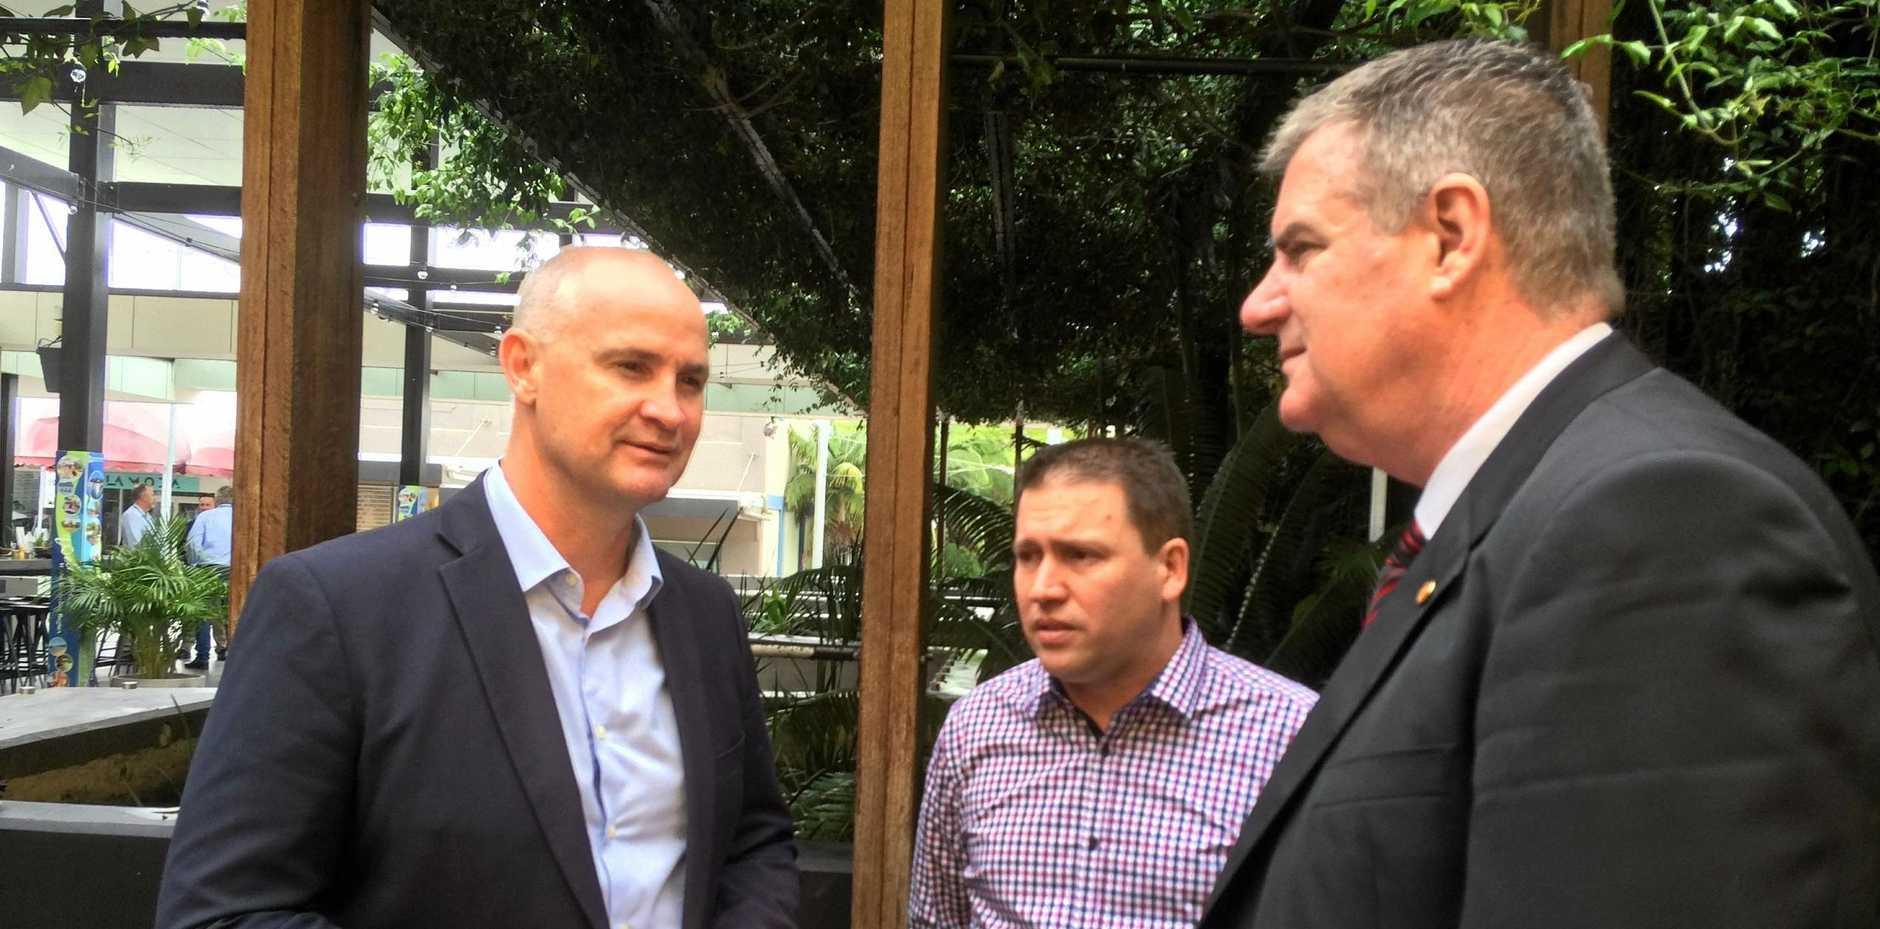 Gladstone MP Glenn Butcher, Gladstone Region Mayor Matt Burnett and Local Government Minister Mark Furner were happy with the funding.